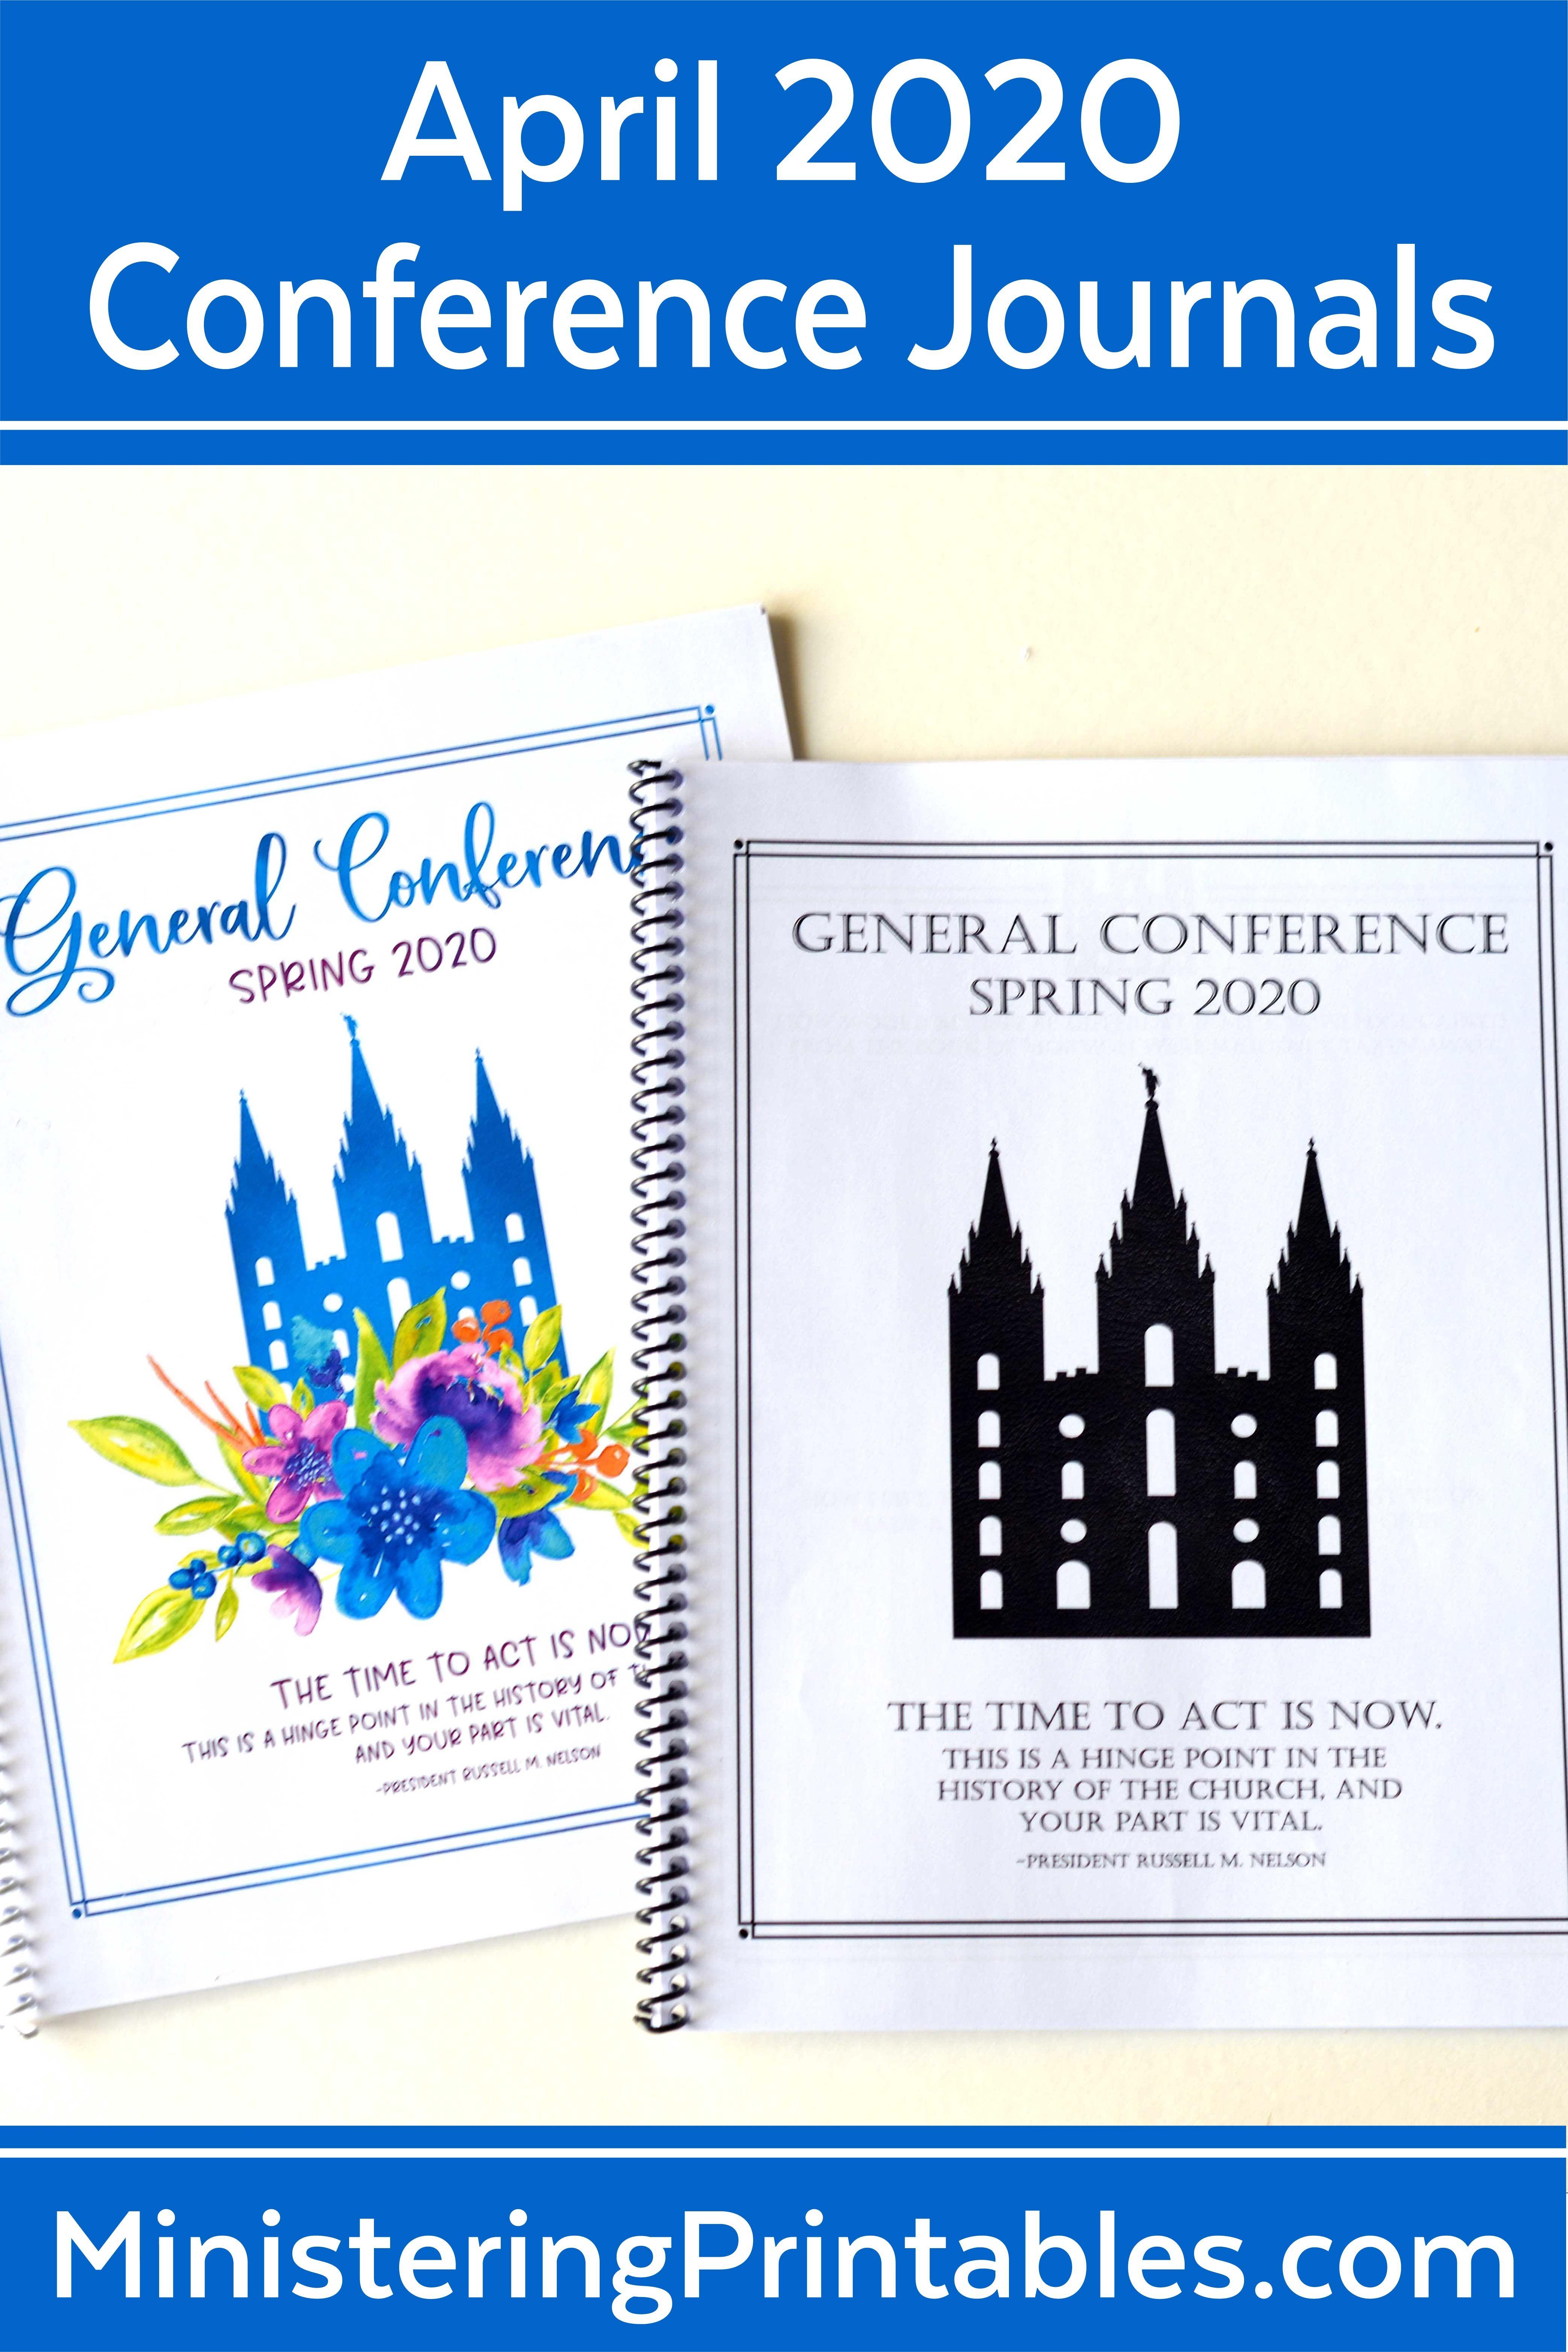 April 2020 General Conference Journals In 2020 General Conference Lds General Conference General Conference Activities